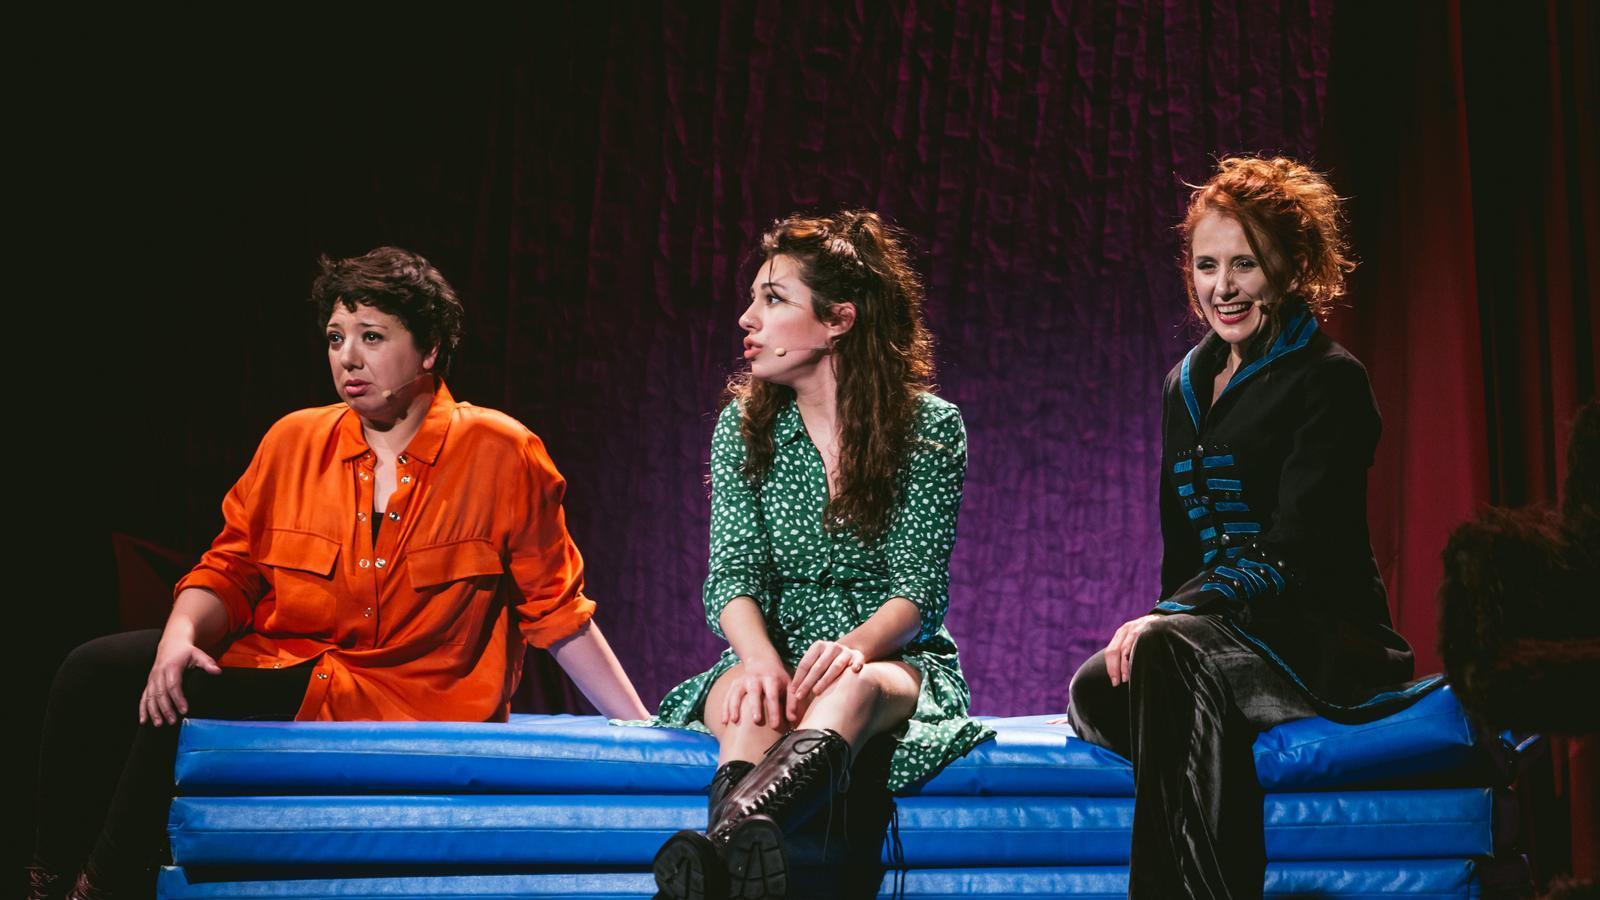 Meritxell Huertas, Aina Quiñones i Alícia González Laá interpreten els 'Monólogos de la vagina'